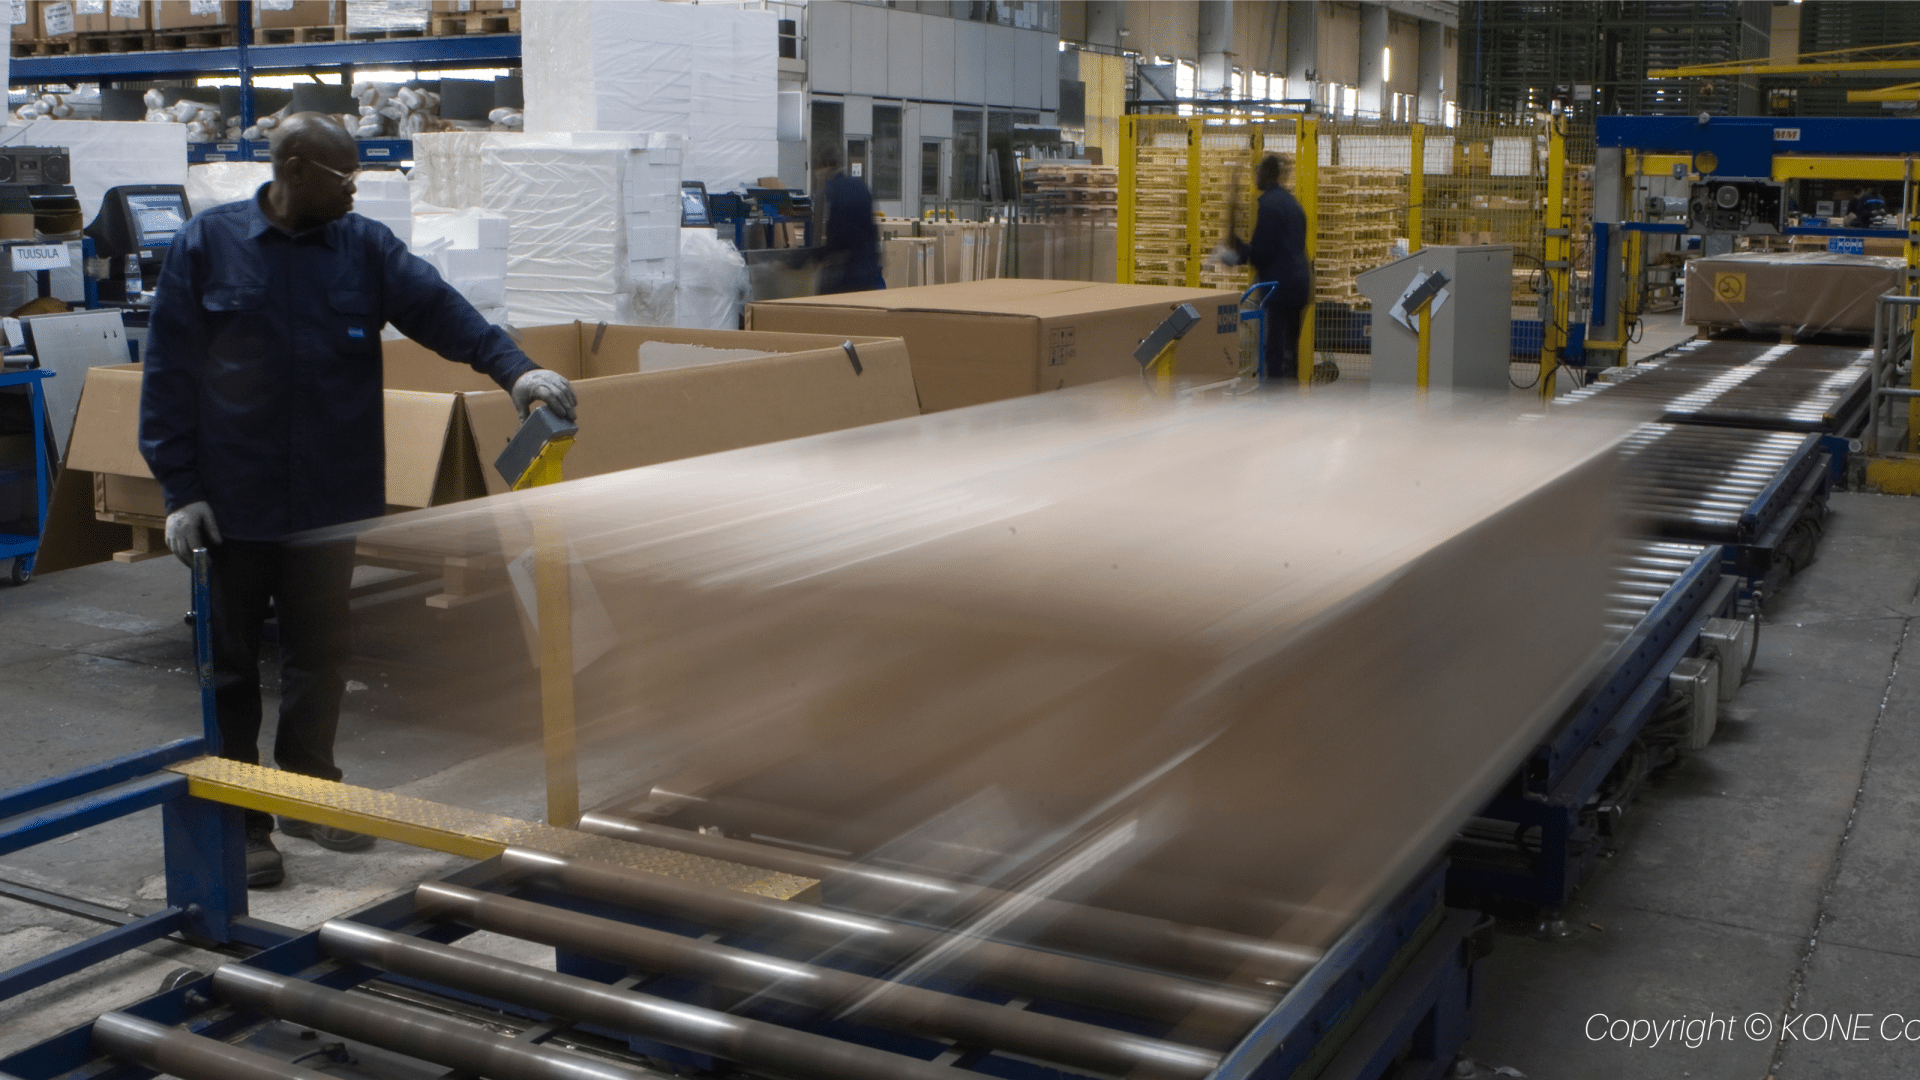 KONE production line